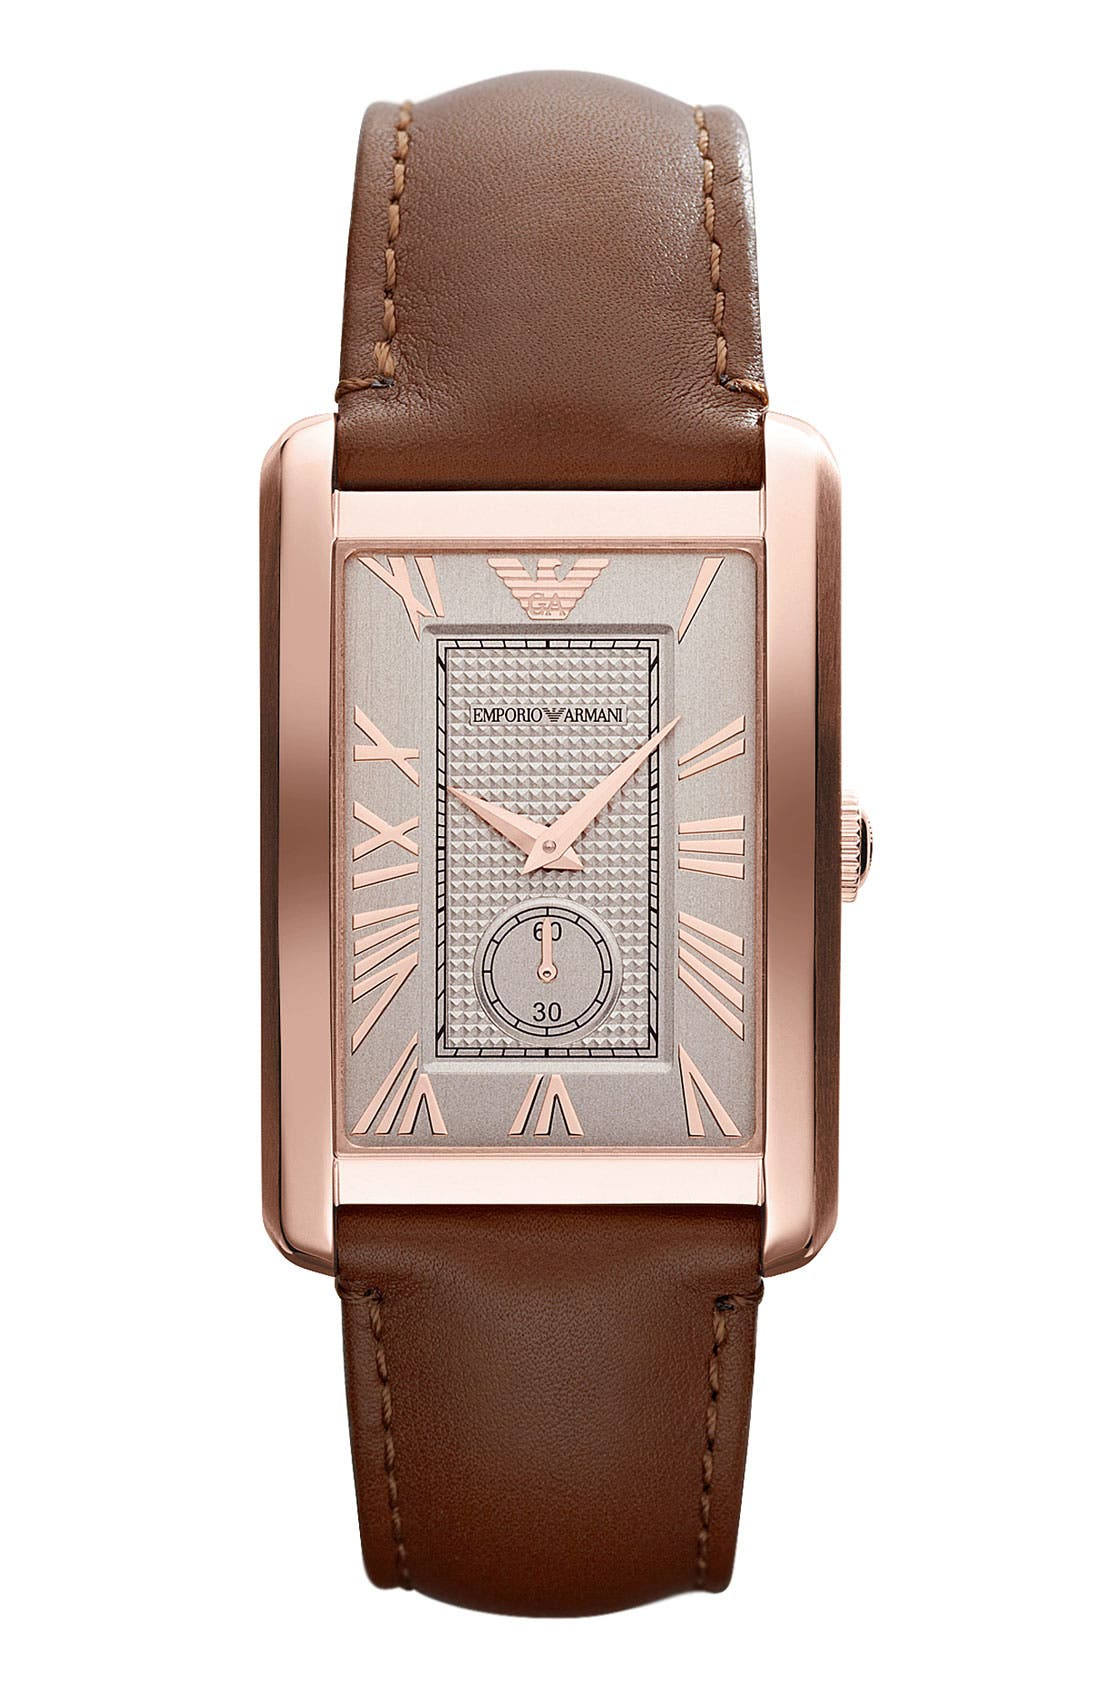 Main Image - Emporio Armani Rectangular Leather Strap Watch, 31mm x 39mm